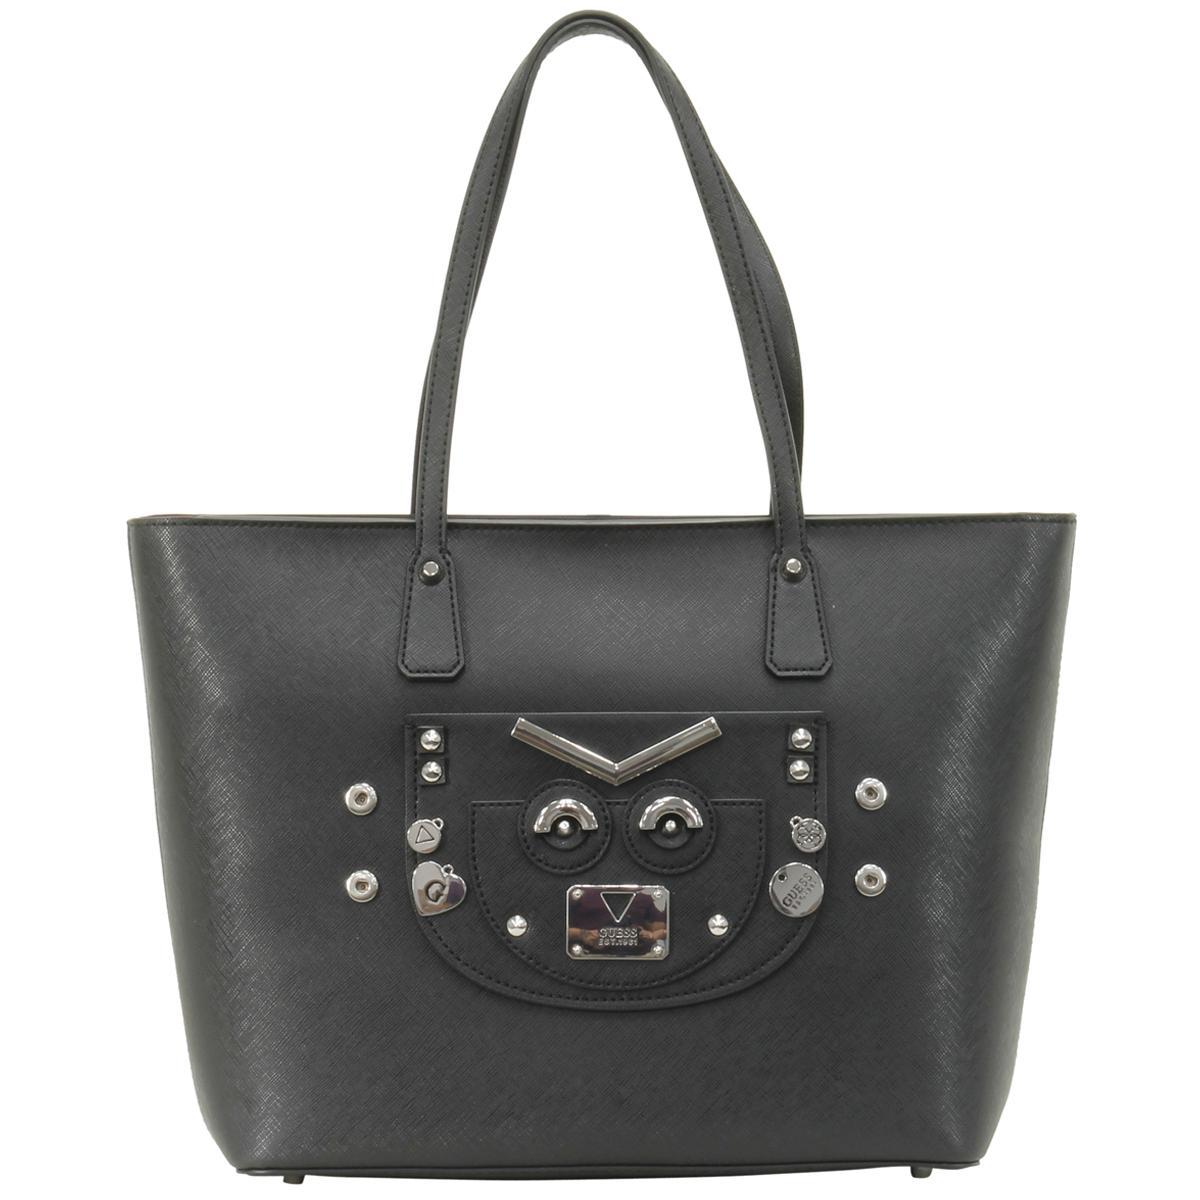 Guess Women's Cyber Rock Saffiano Tote Handbag